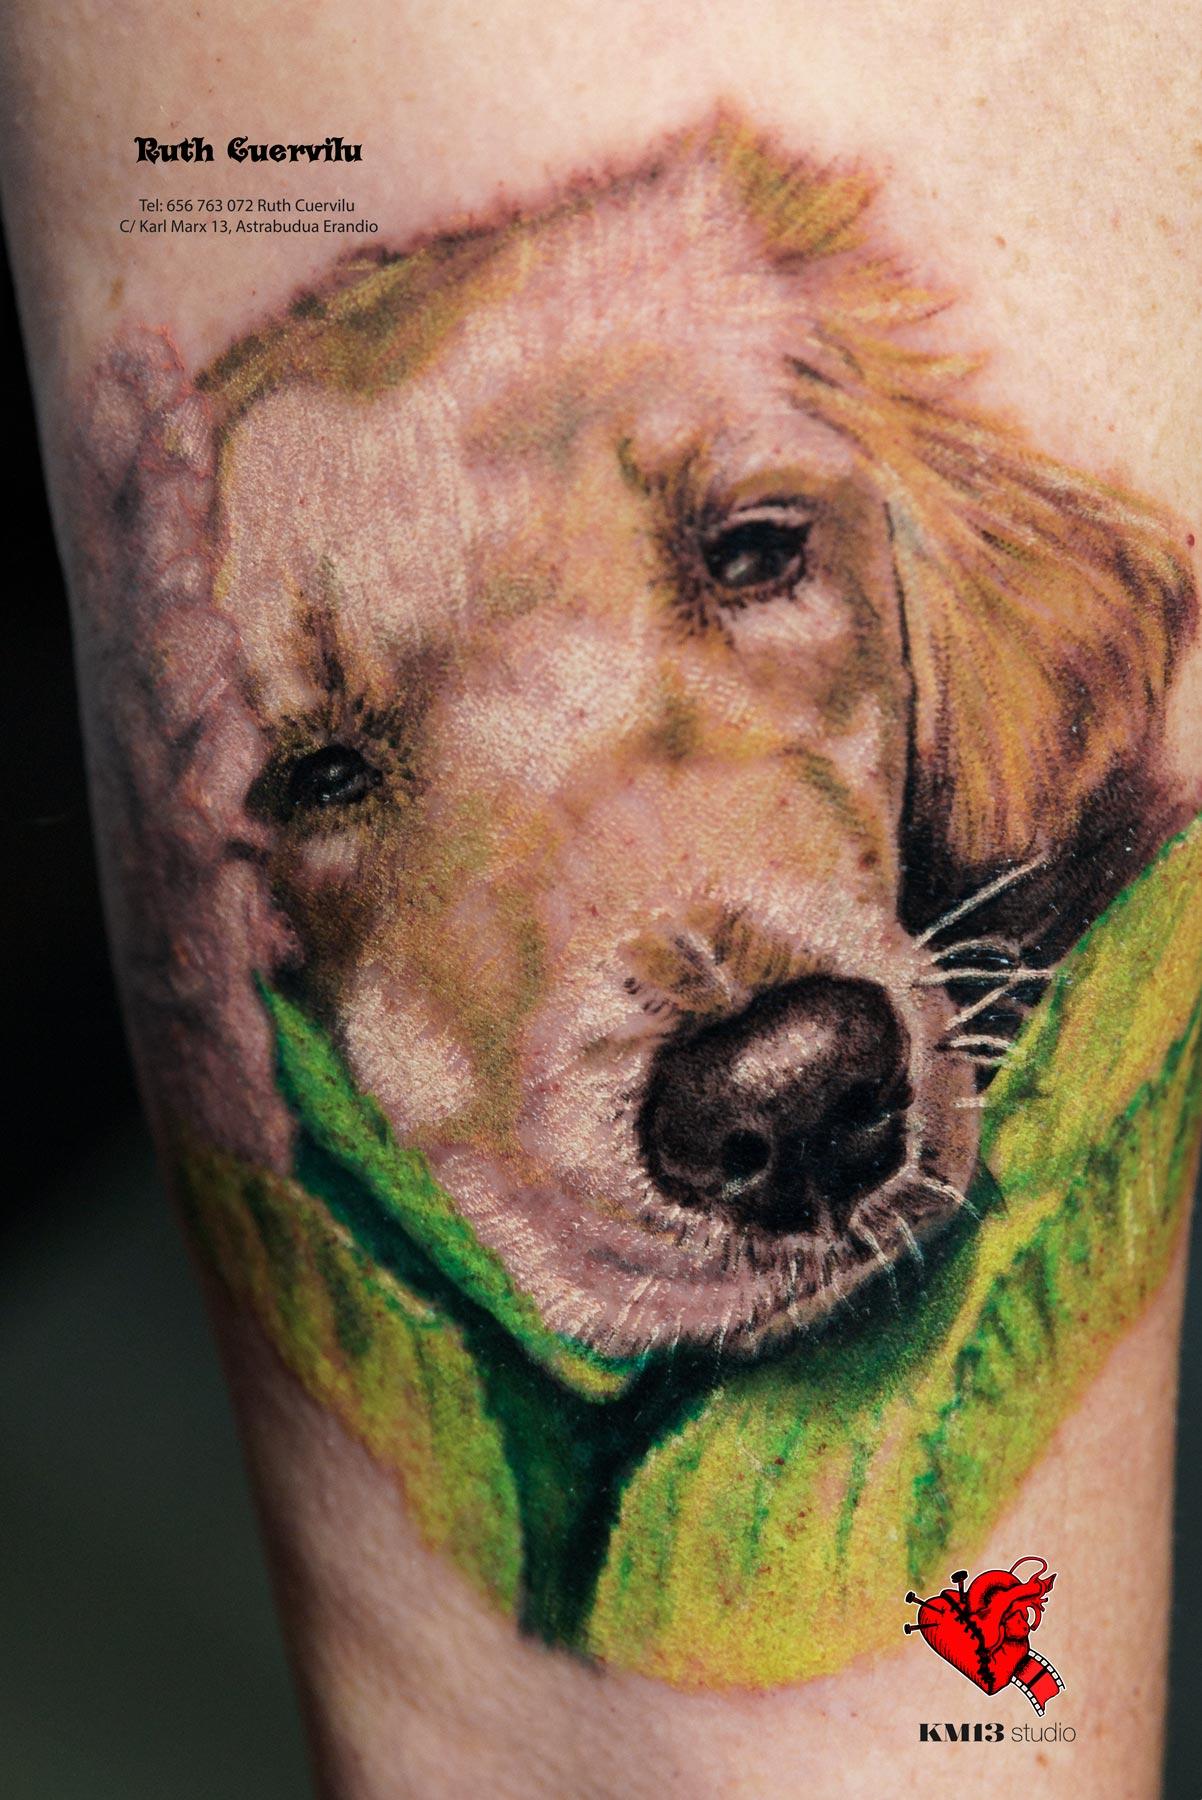 Tatuaje Mascota Realismo a color Perrito Bimba - Ruth Cuervilu Tattoo - KM13 Studio - estudio de tatuajes erandio astrabudua bilbao bizkaia